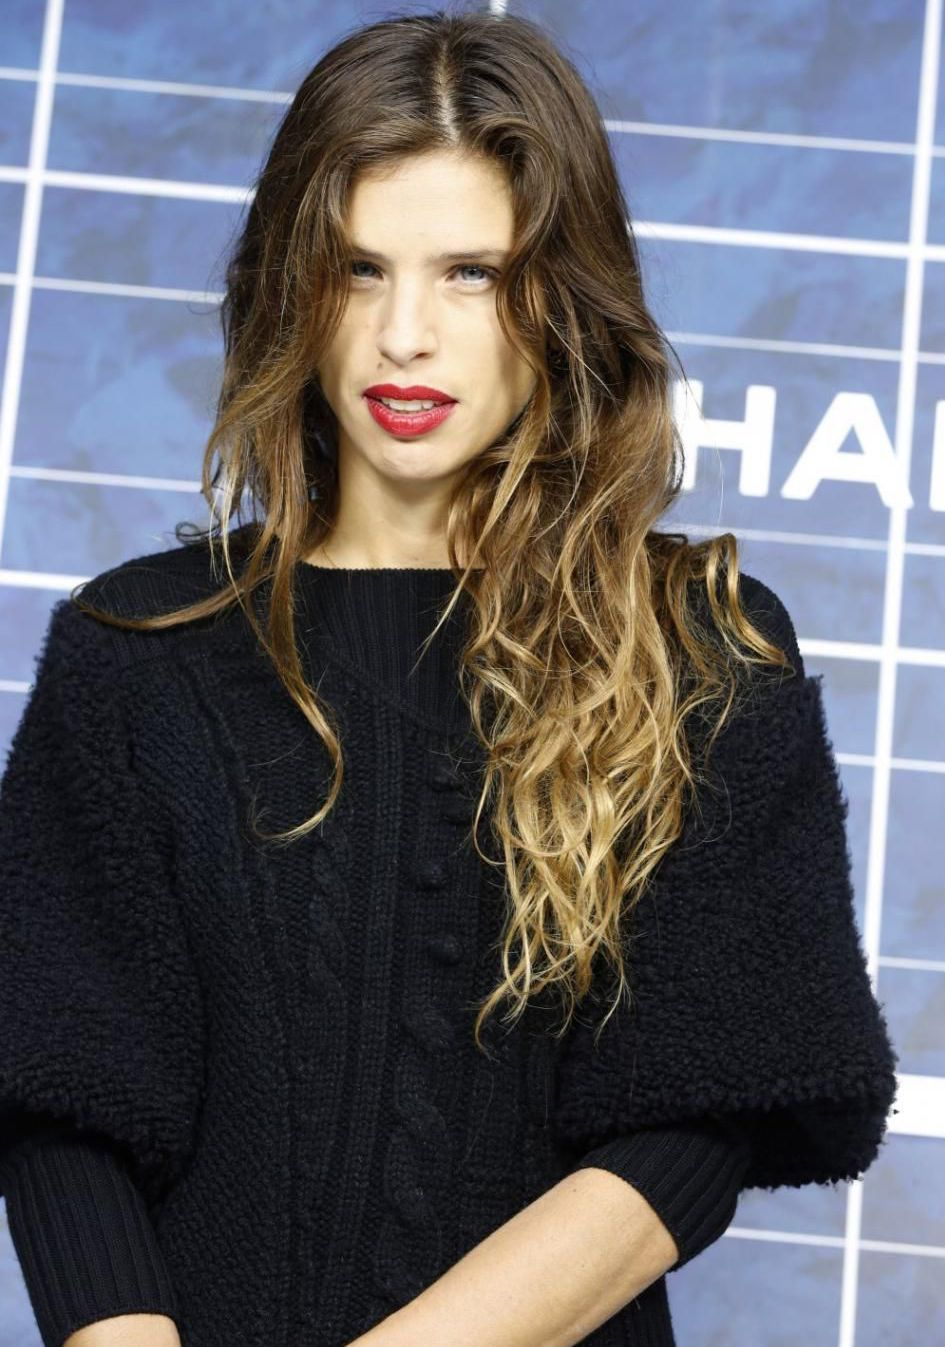 Maïwenn cheveux long pull noir panneau Chanel Part.1-Atlaneastro